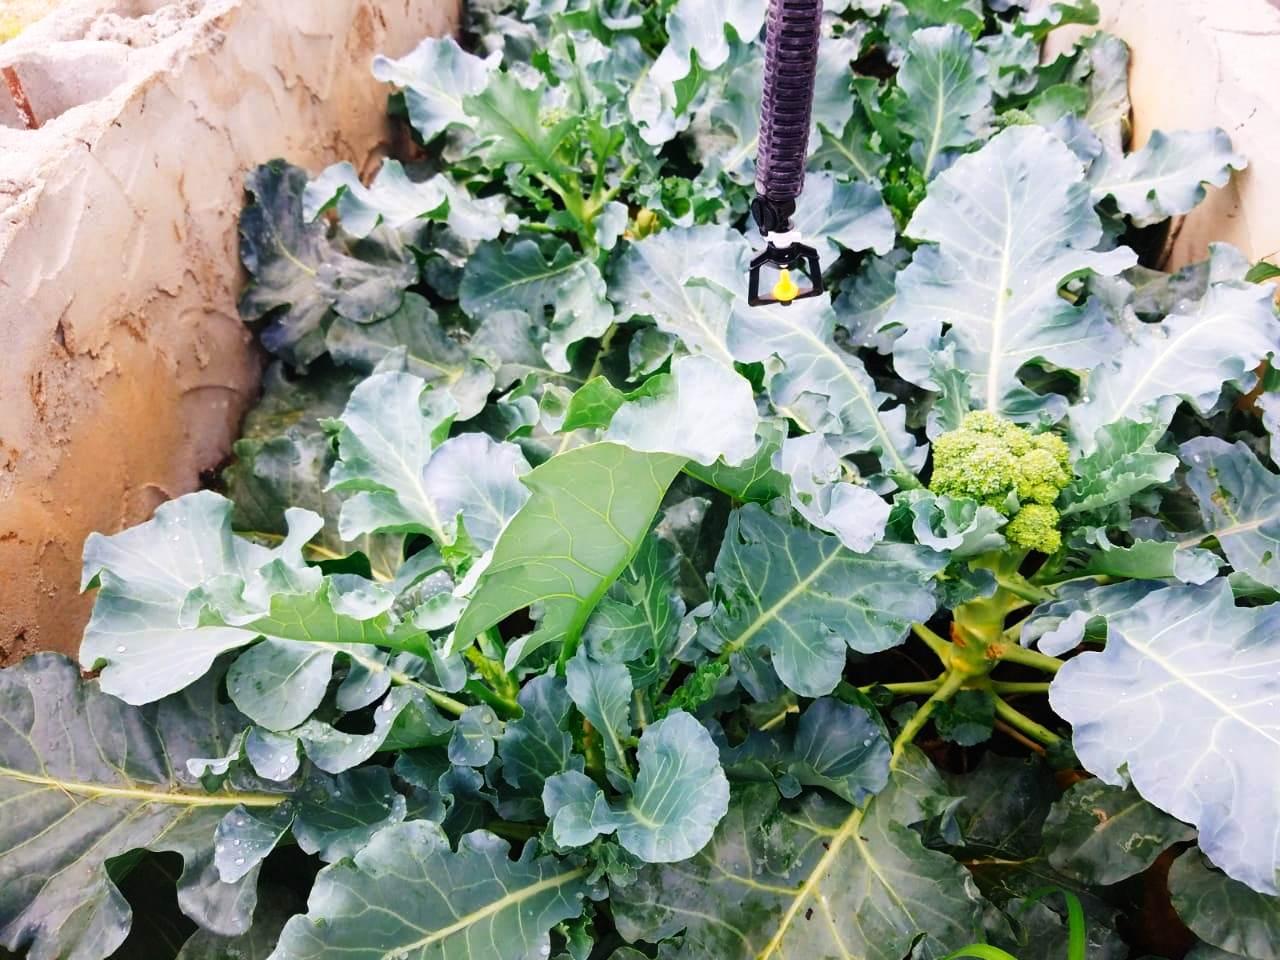 Broccoli grown at GSA